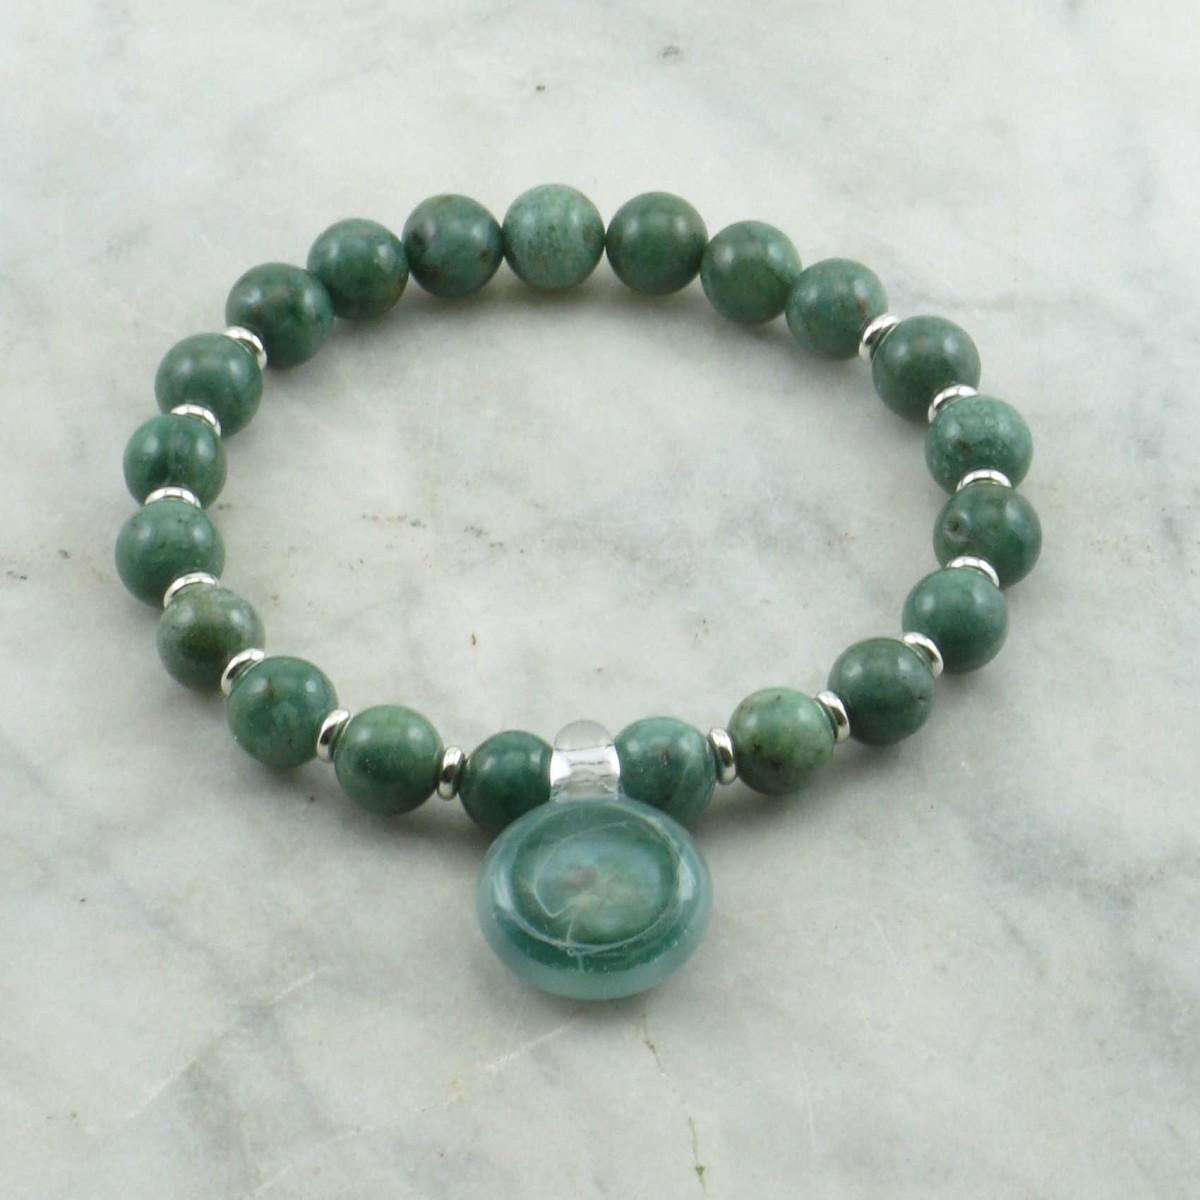 Chi_Mala_Bracelet_21_JadeMala_Beads_Buddhist_Bracelet